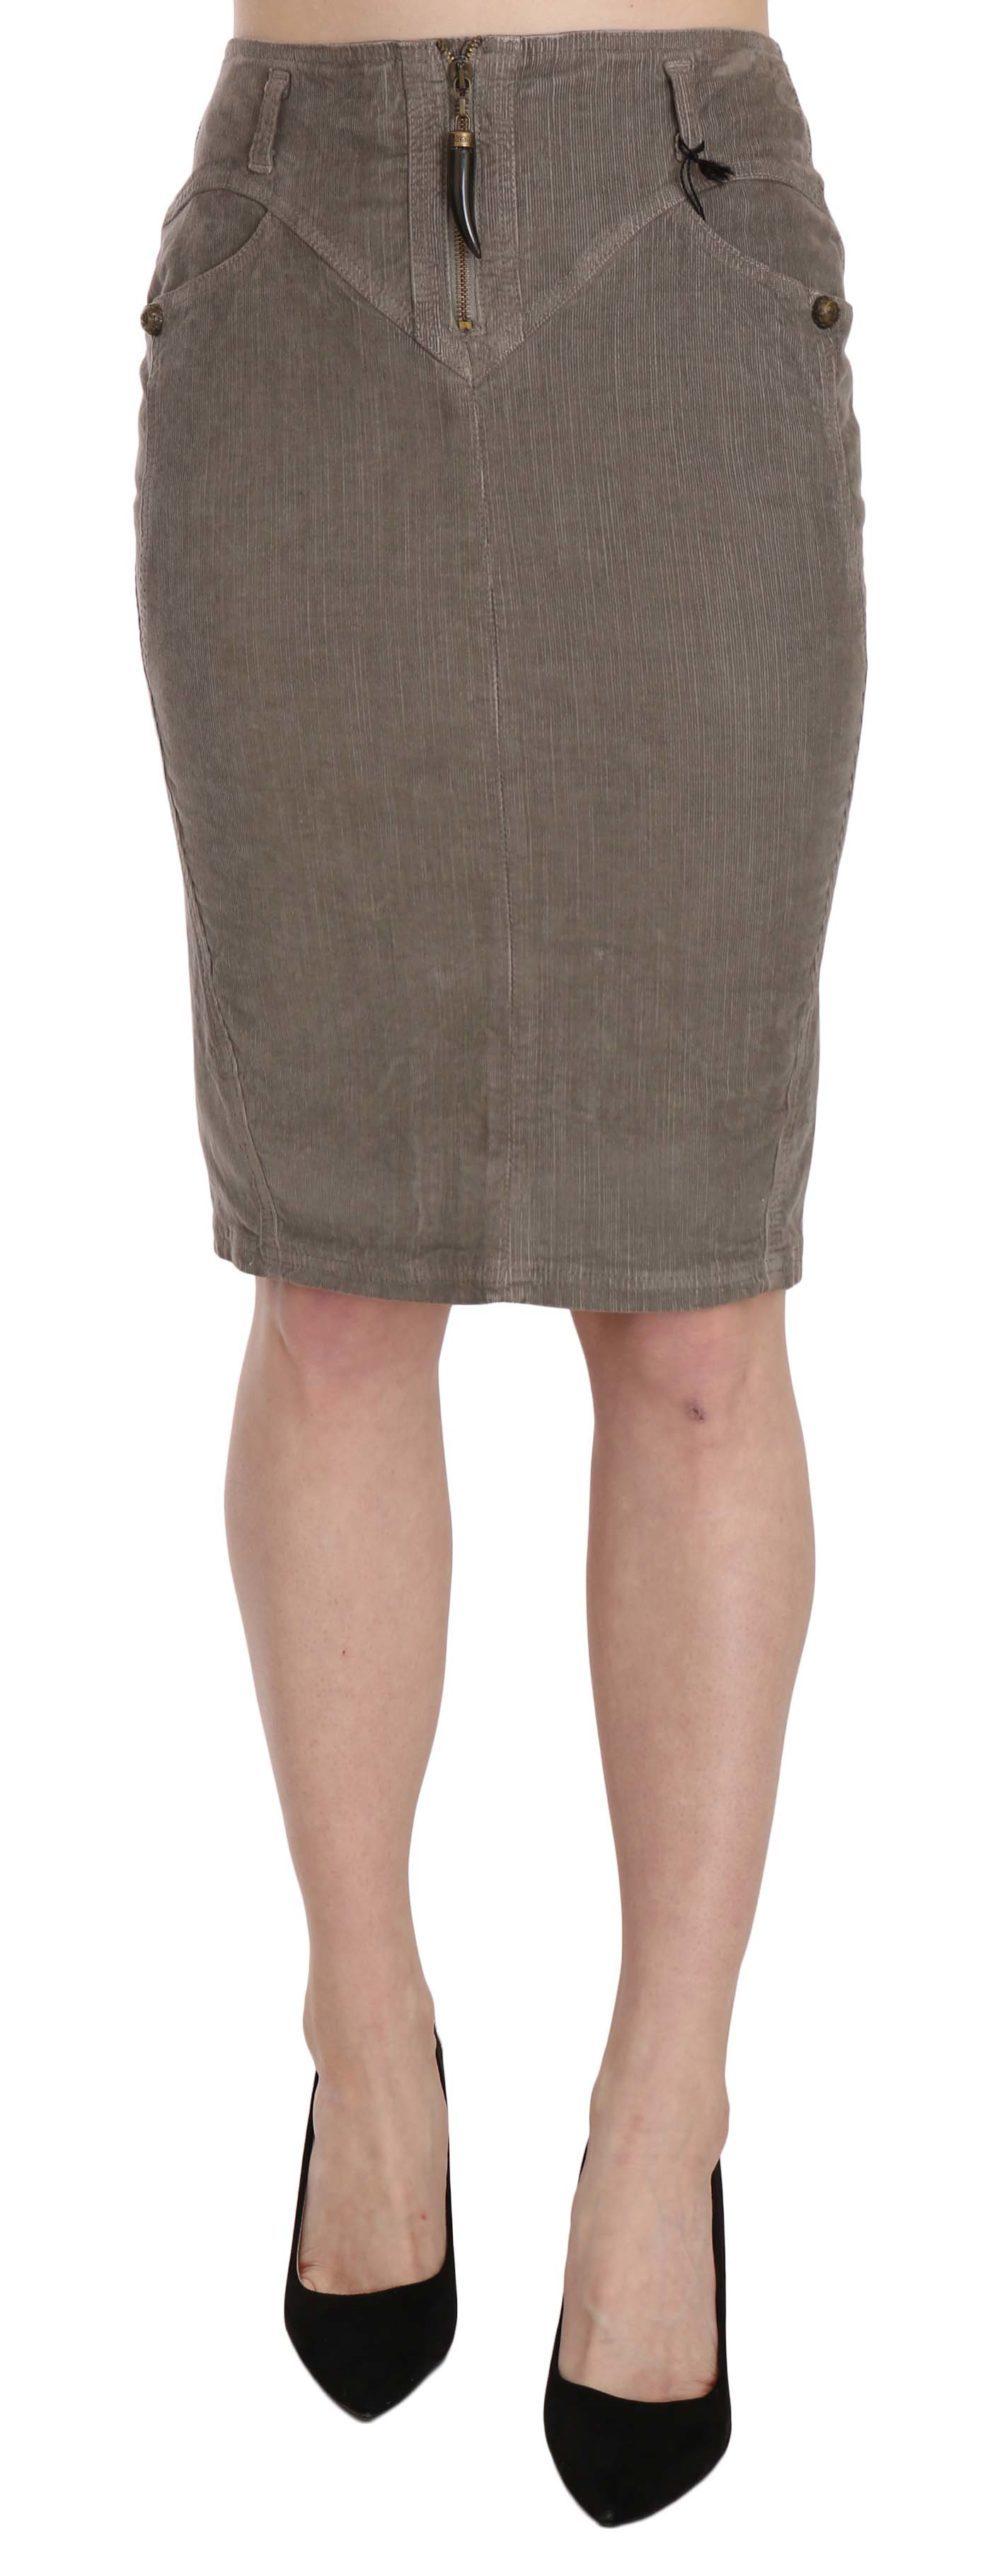 Just Cavalli Women's Corduroy Straight A-Line Skirt Gray PAN70326 - IT40|S